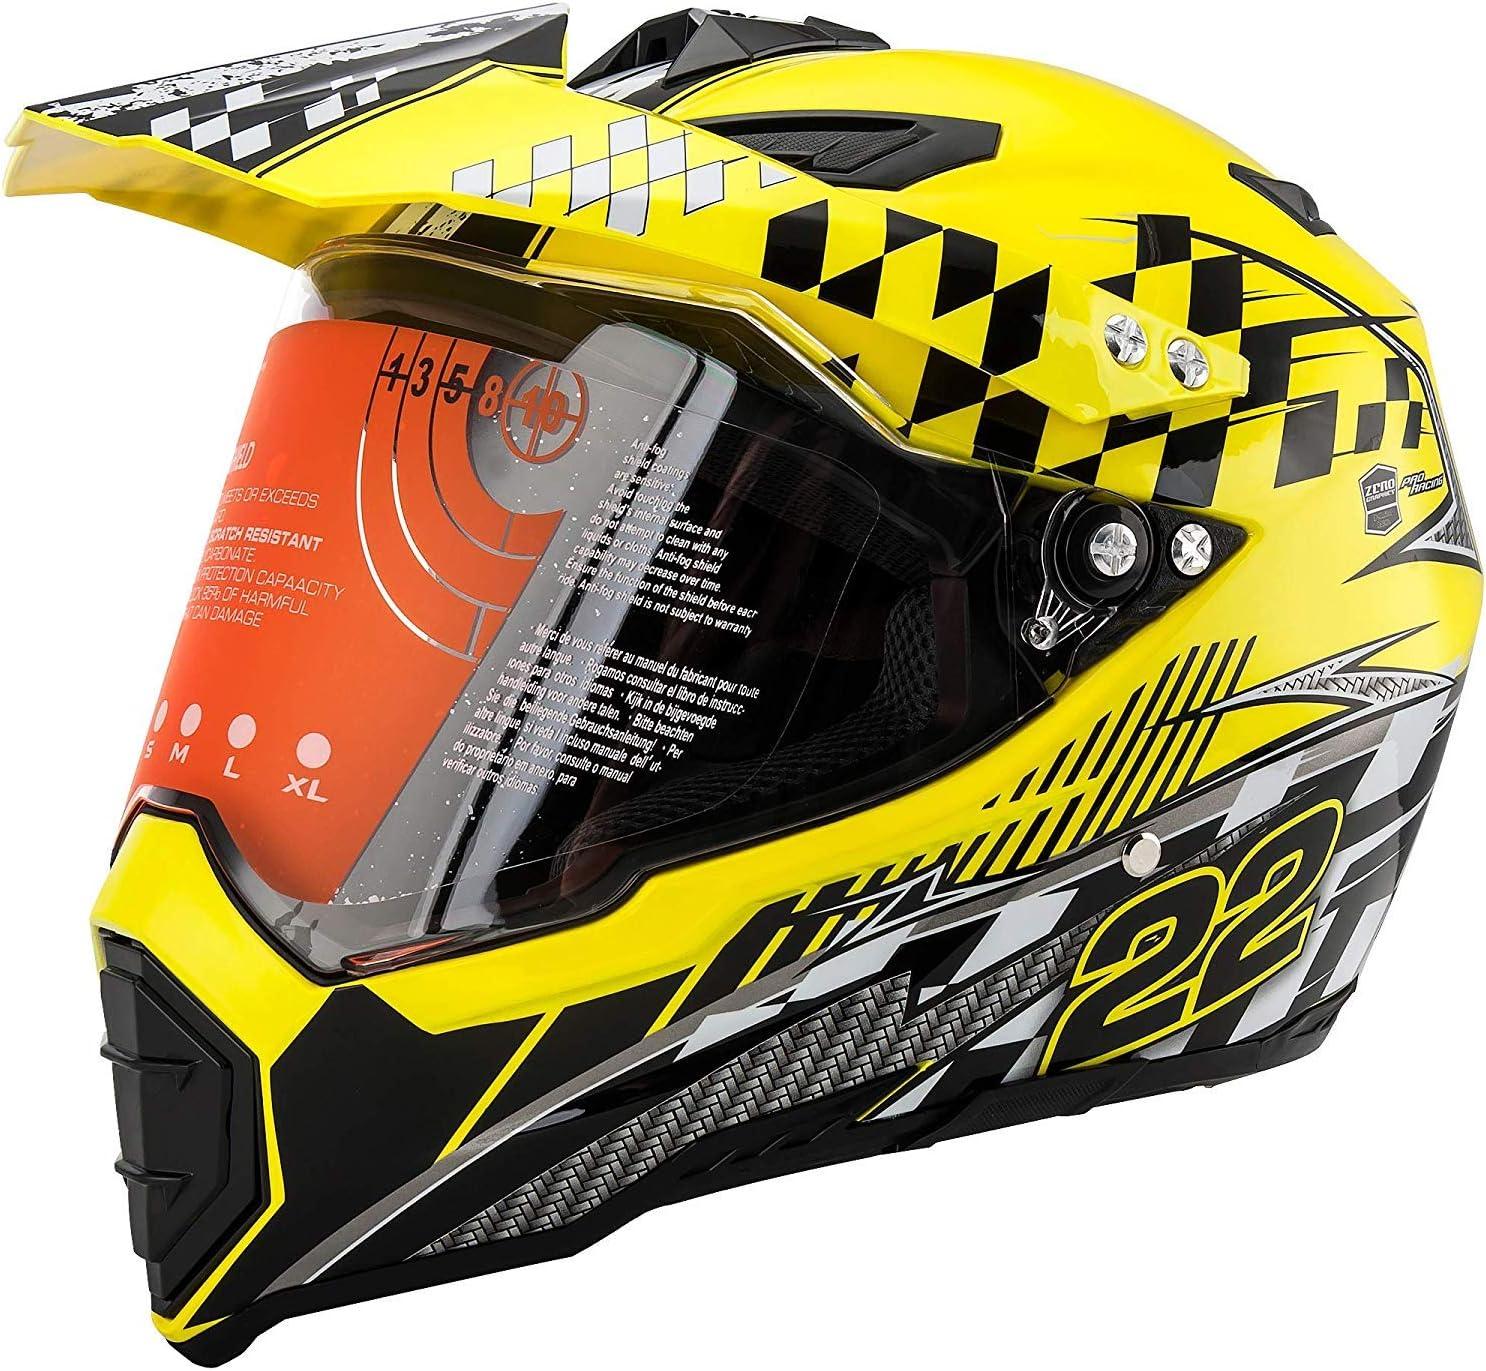 ZJRA Adult Rockstar Motocross Helmet,MX Motorcycle Helmet Dirt Bike ATV Scooter DOT Certified Motorbike Helmet with Goggles Gloves Mask,L58~59cm